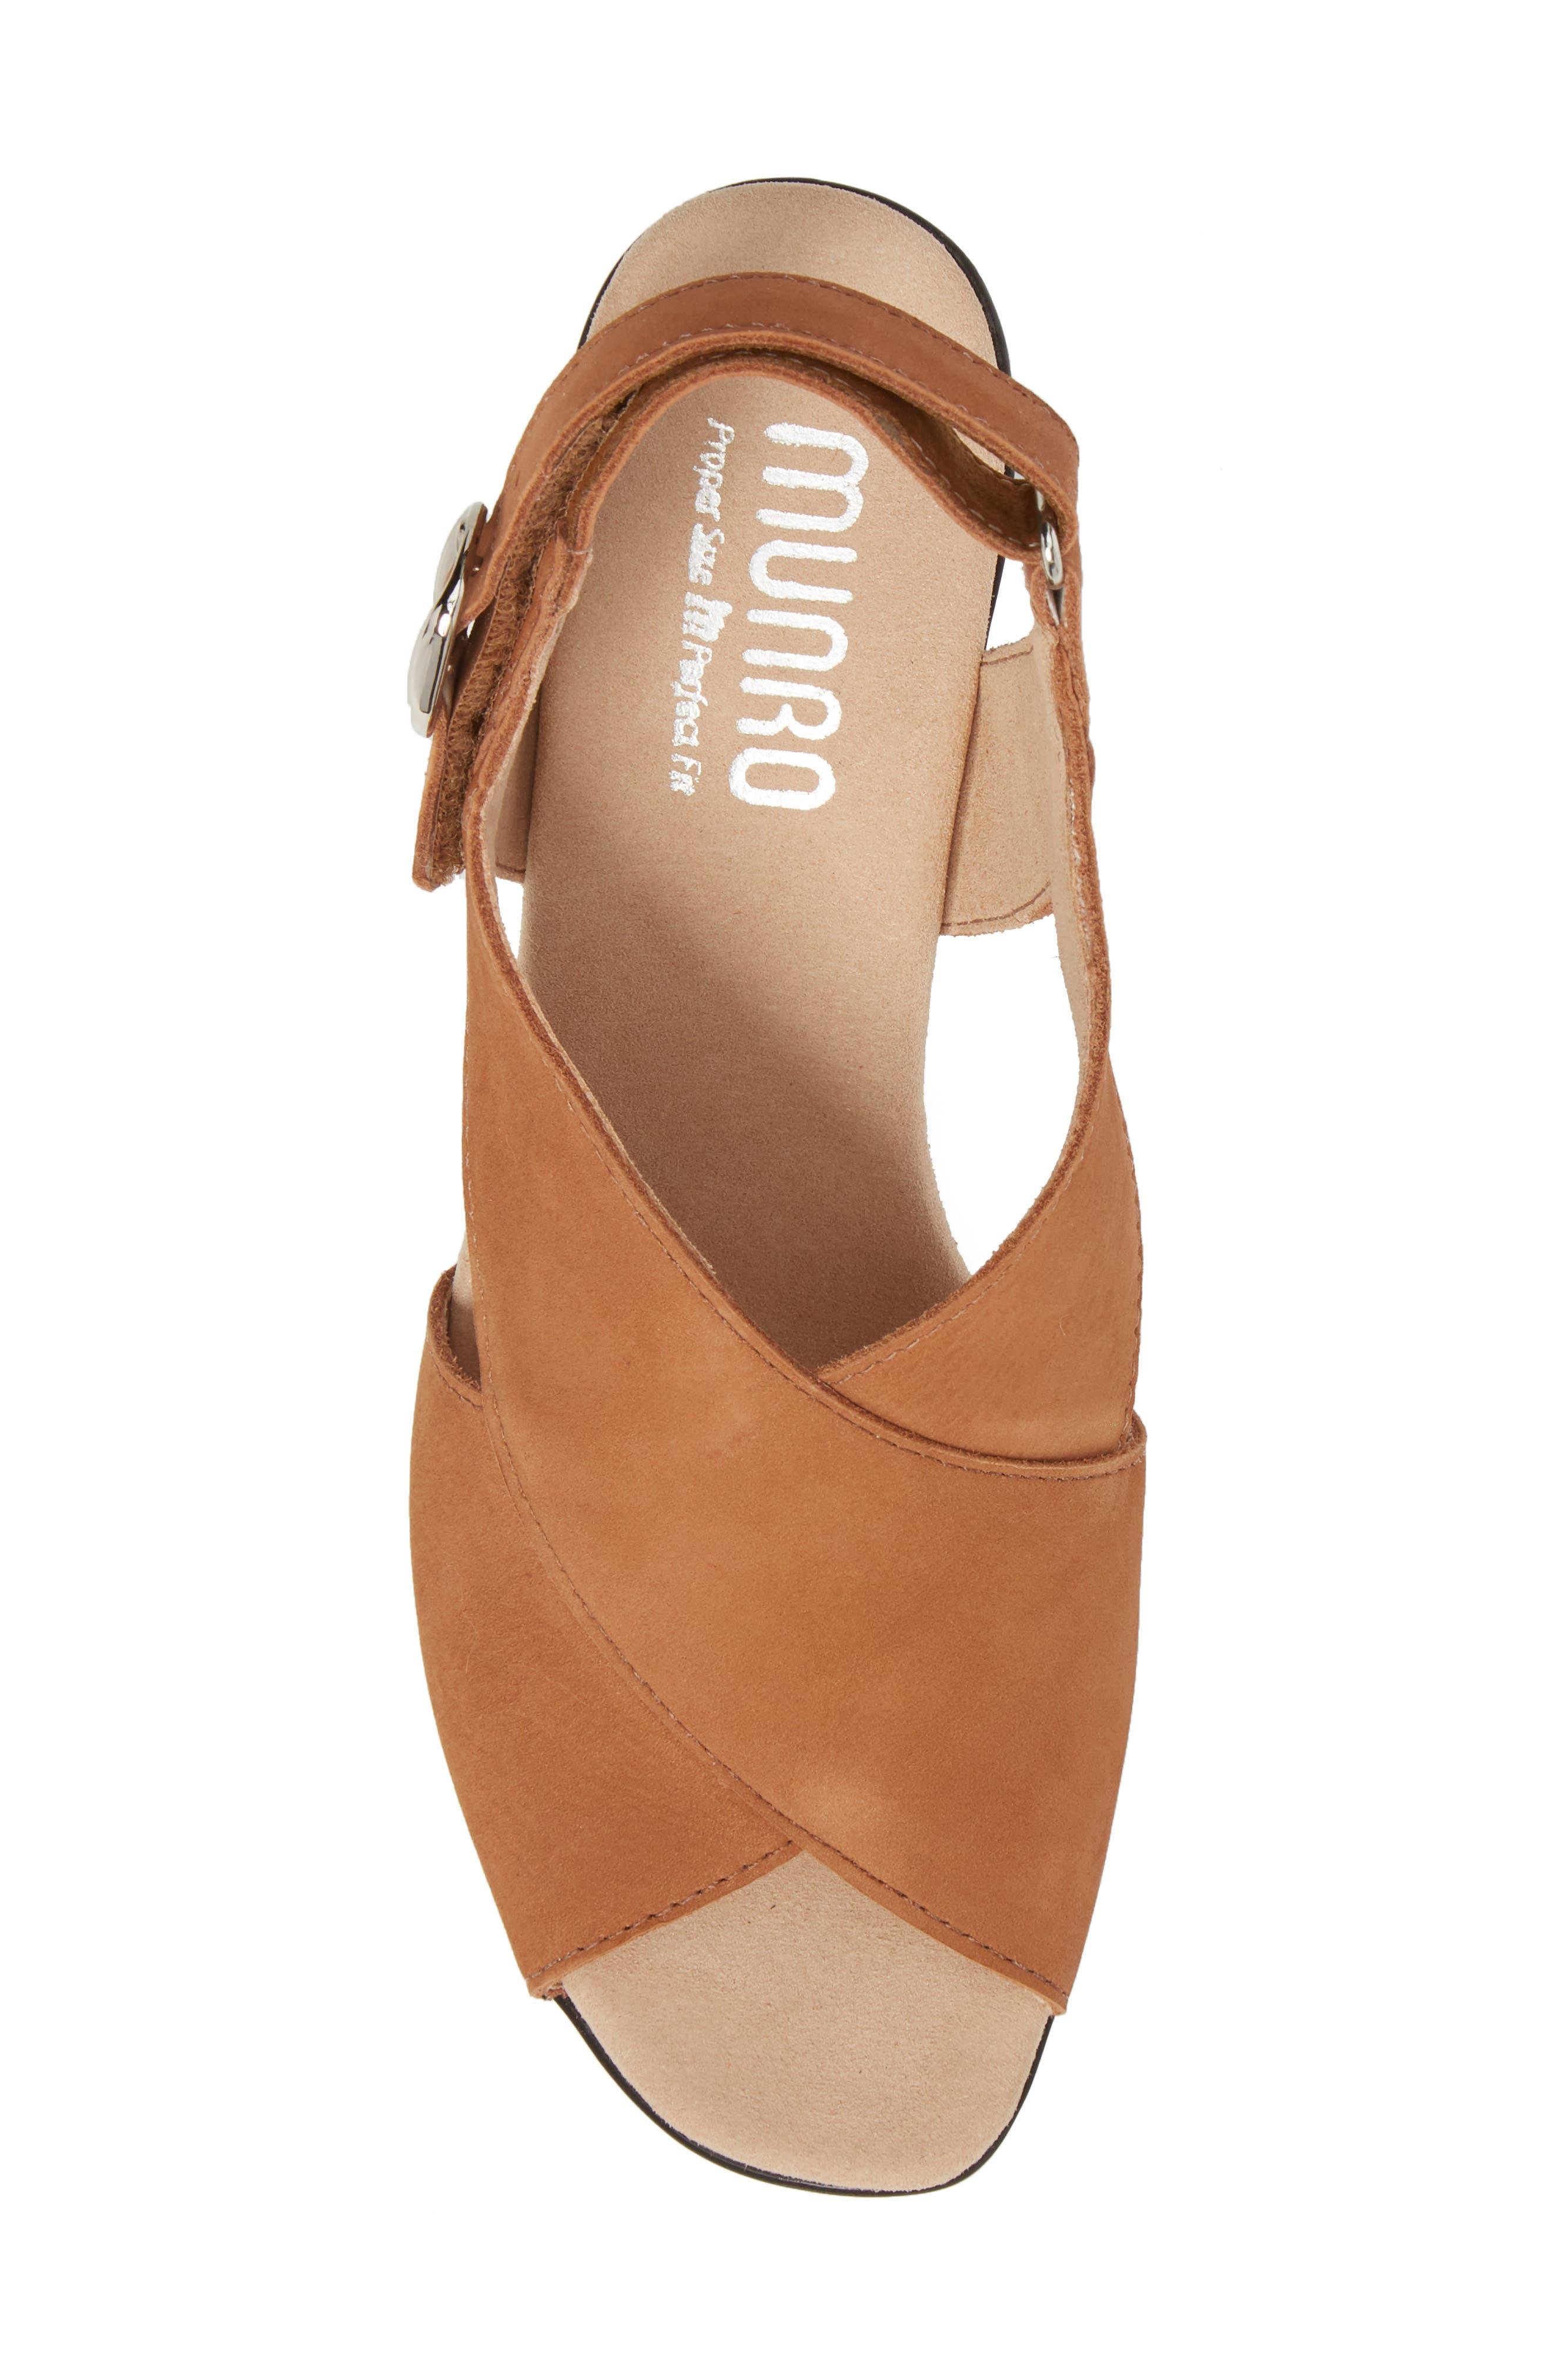 Laine Block Heel Sandal,                             Alternate thumbnail 5, color,                             Brown Nubuck Leather